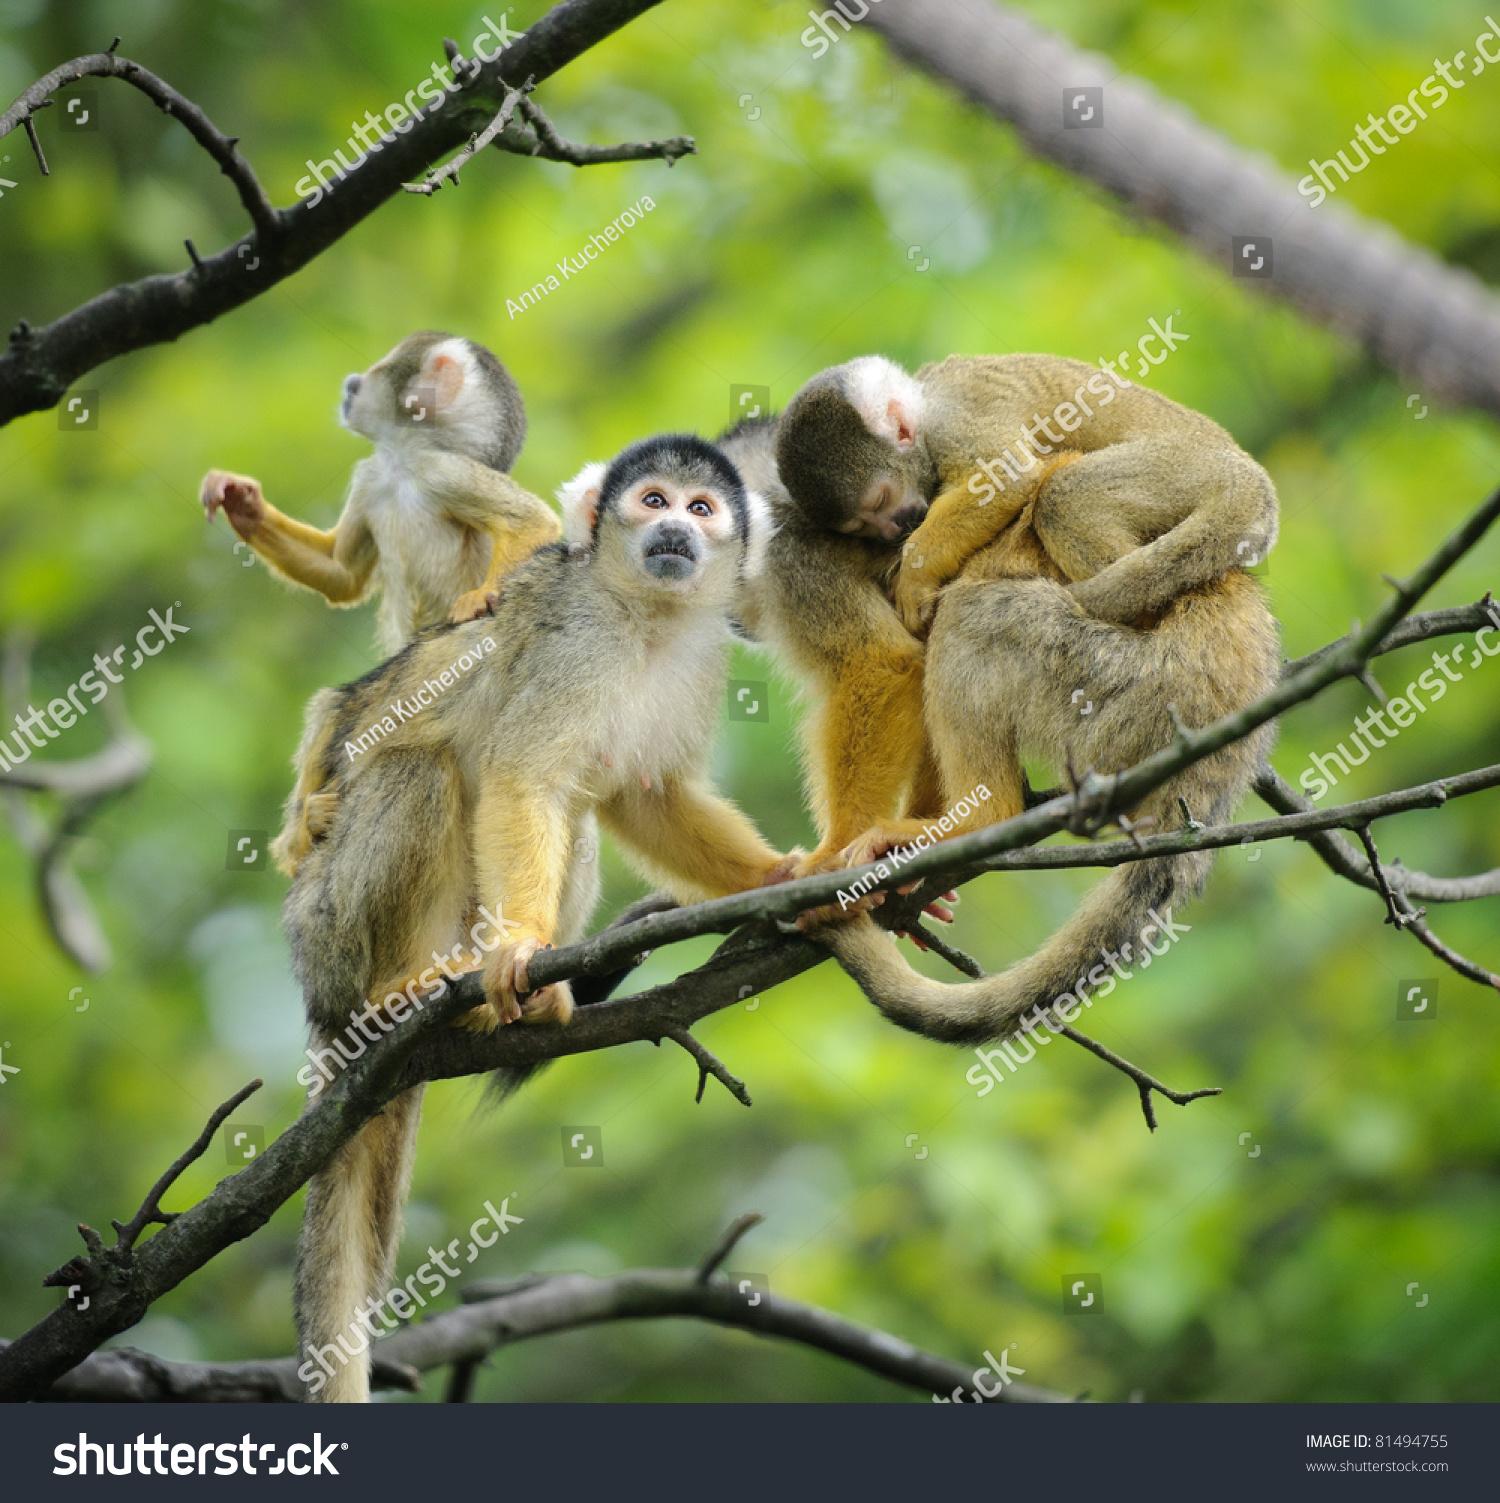 Squirrel monkeys in trees - photo#4